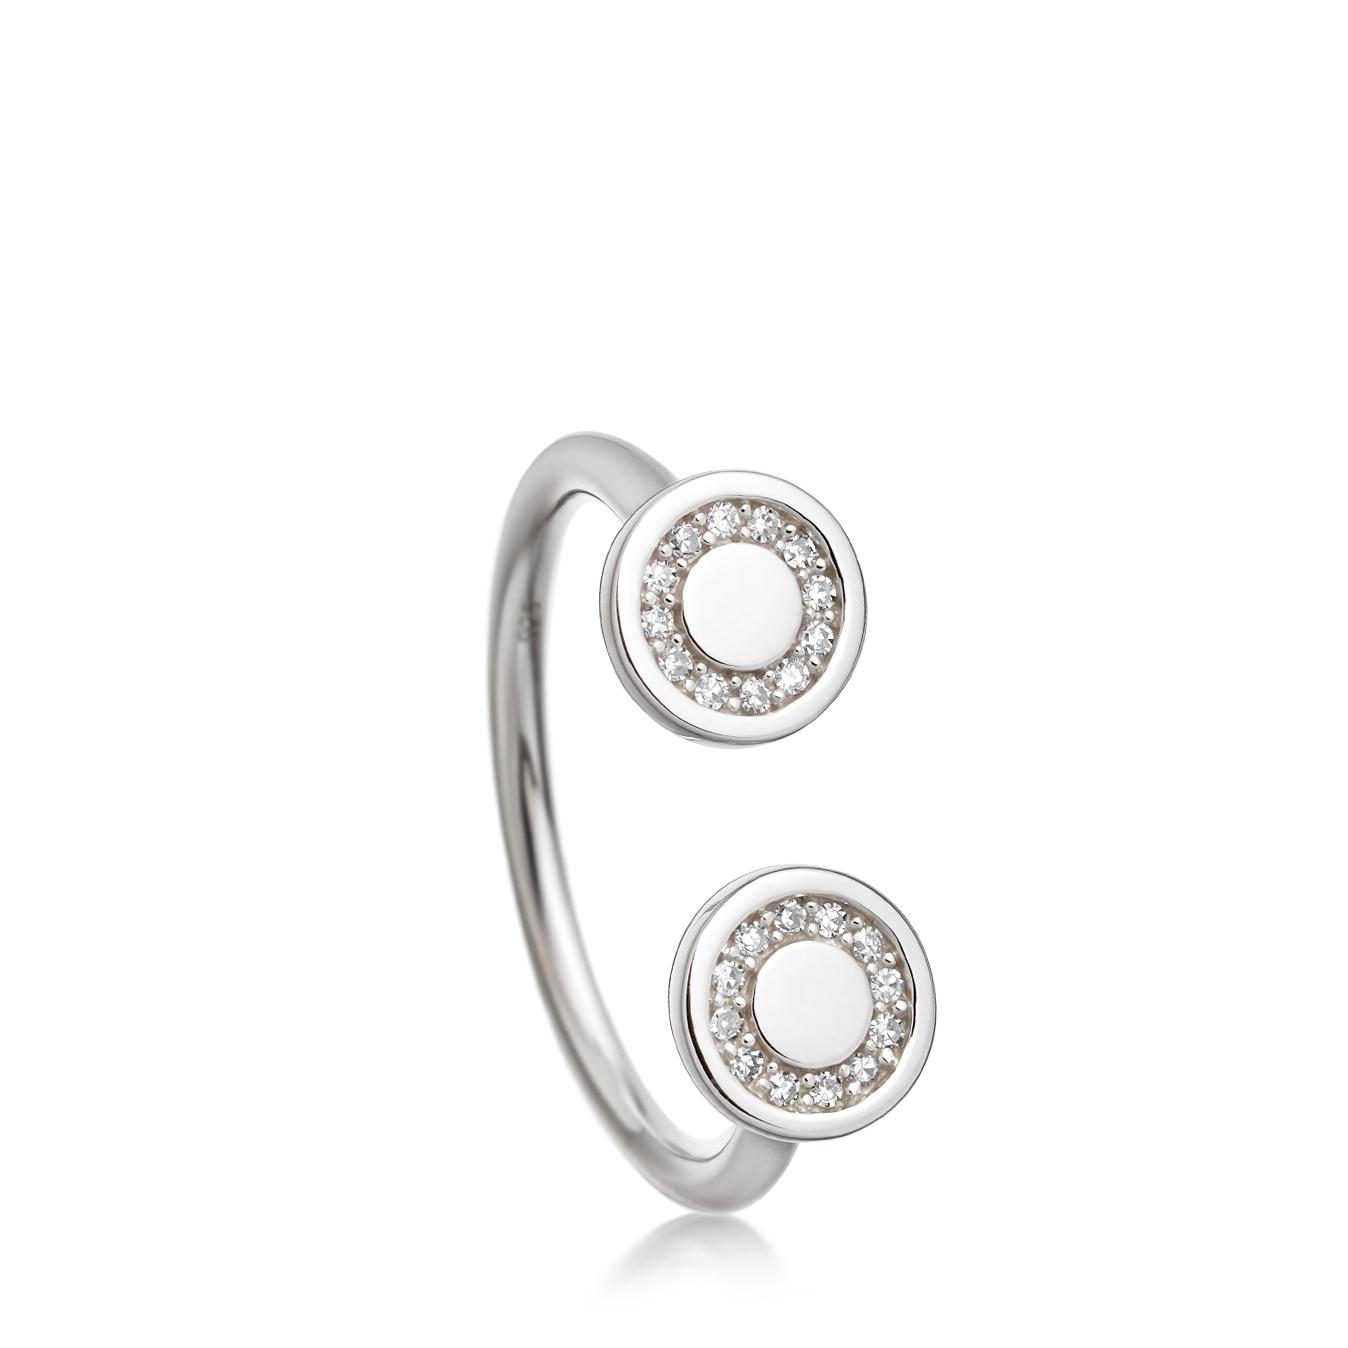 Mini Cosmos Open Ring